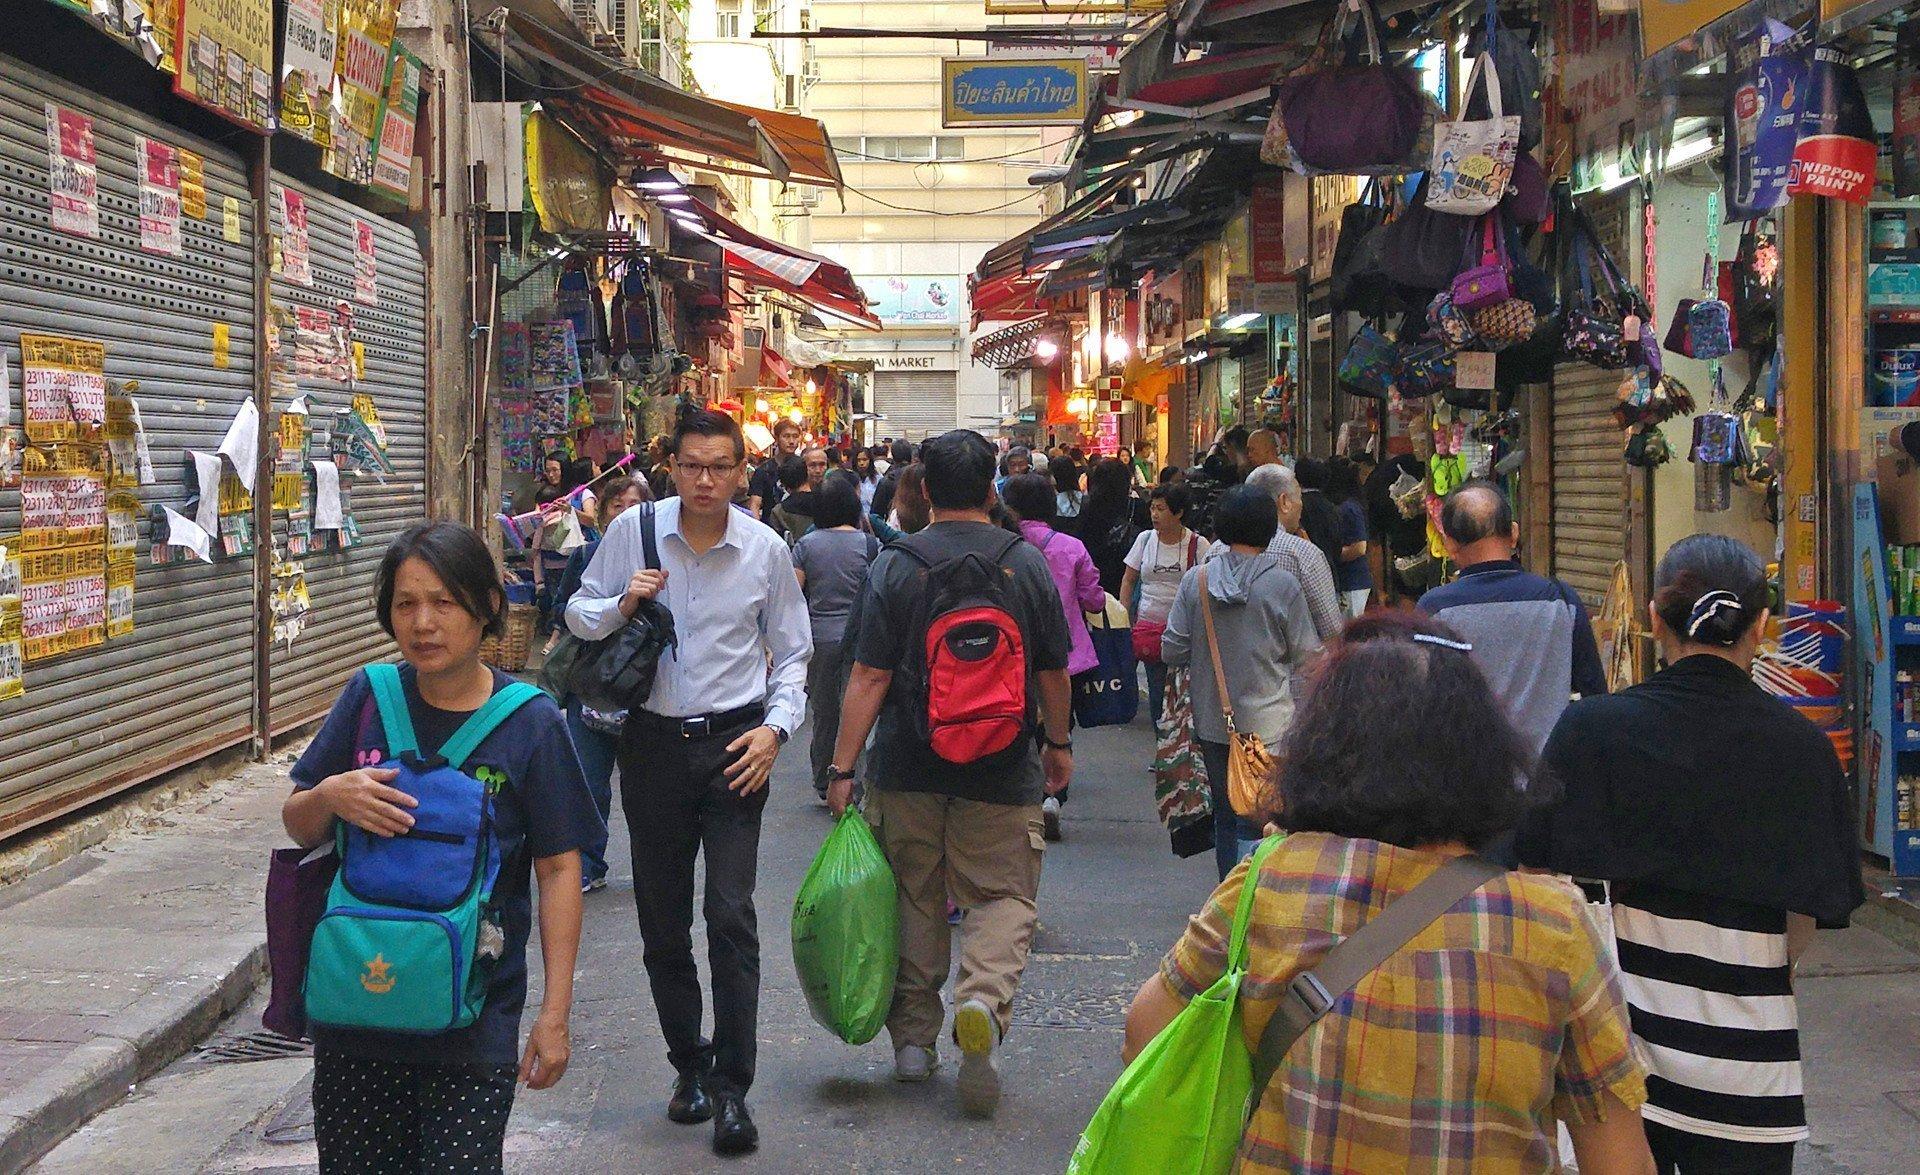 Wan Chai Market and vicinity.